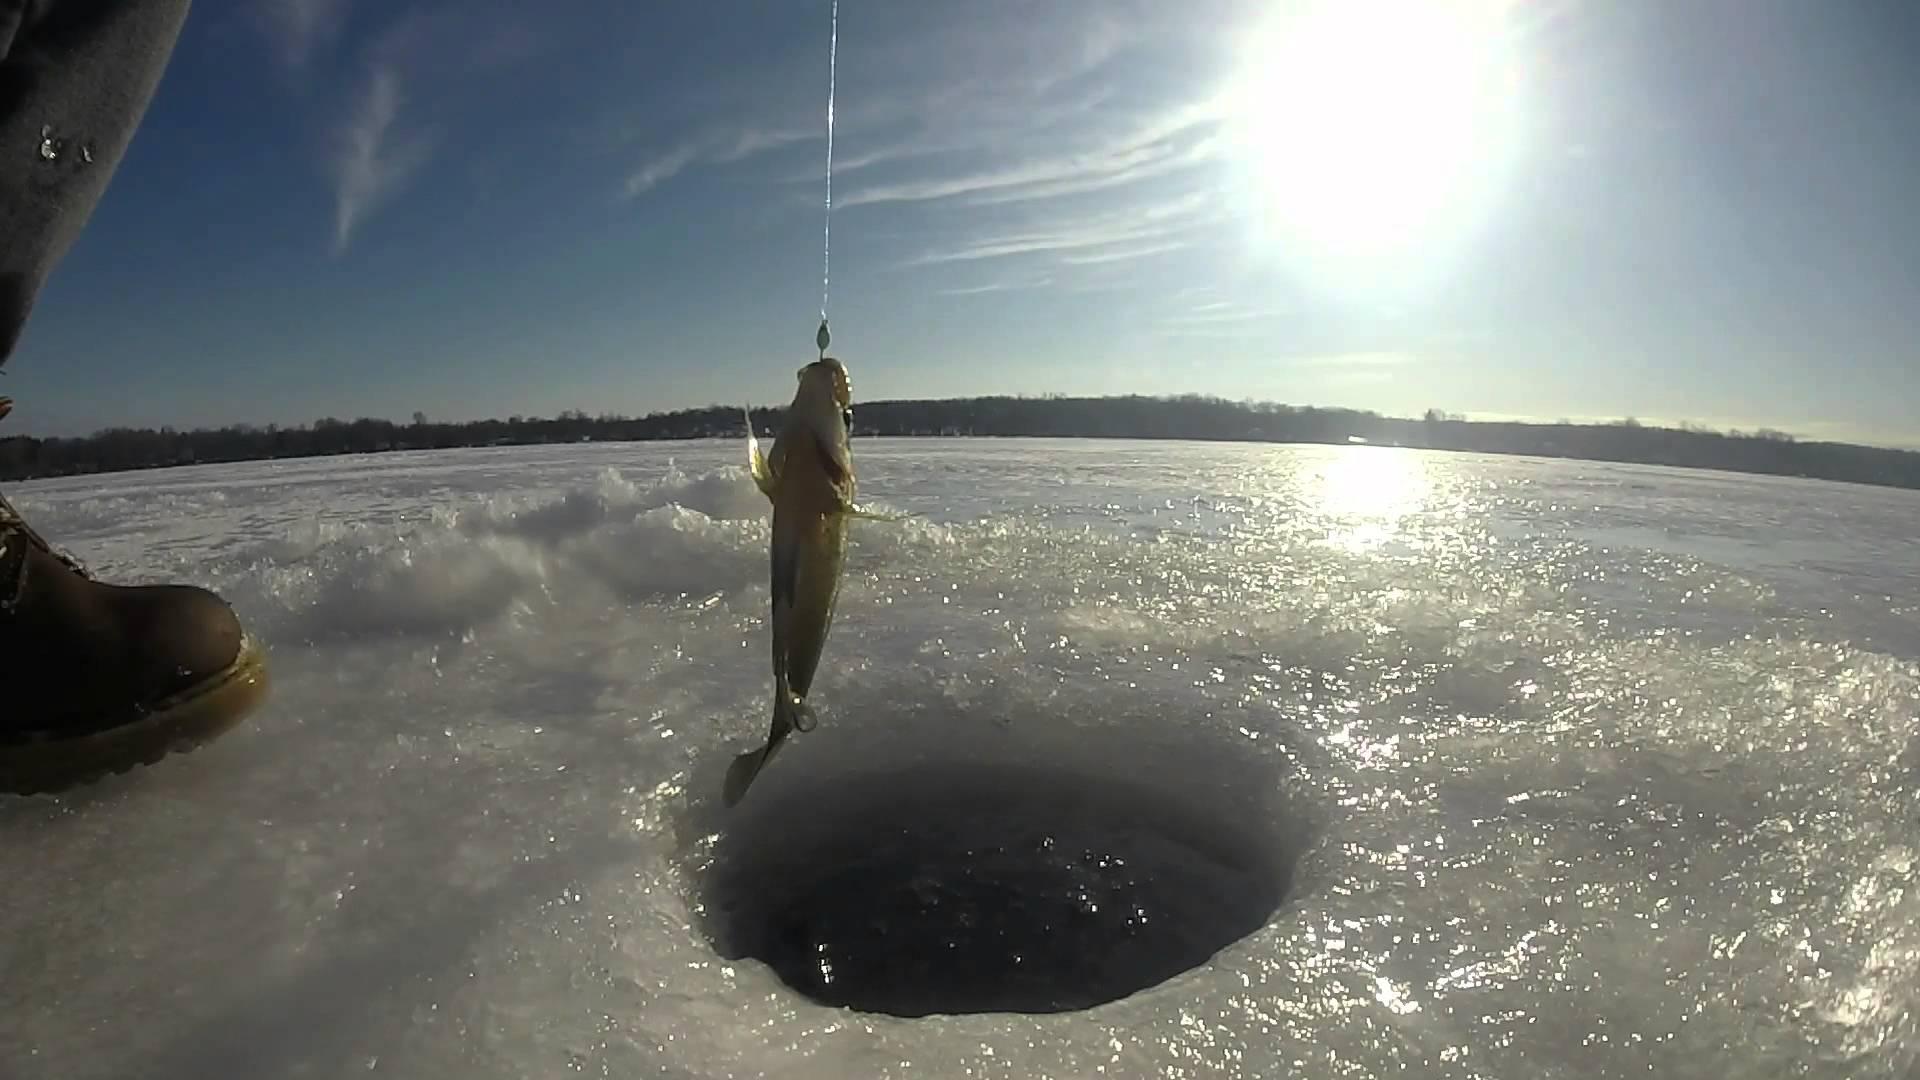 Ice Fishing on Conesus Lake